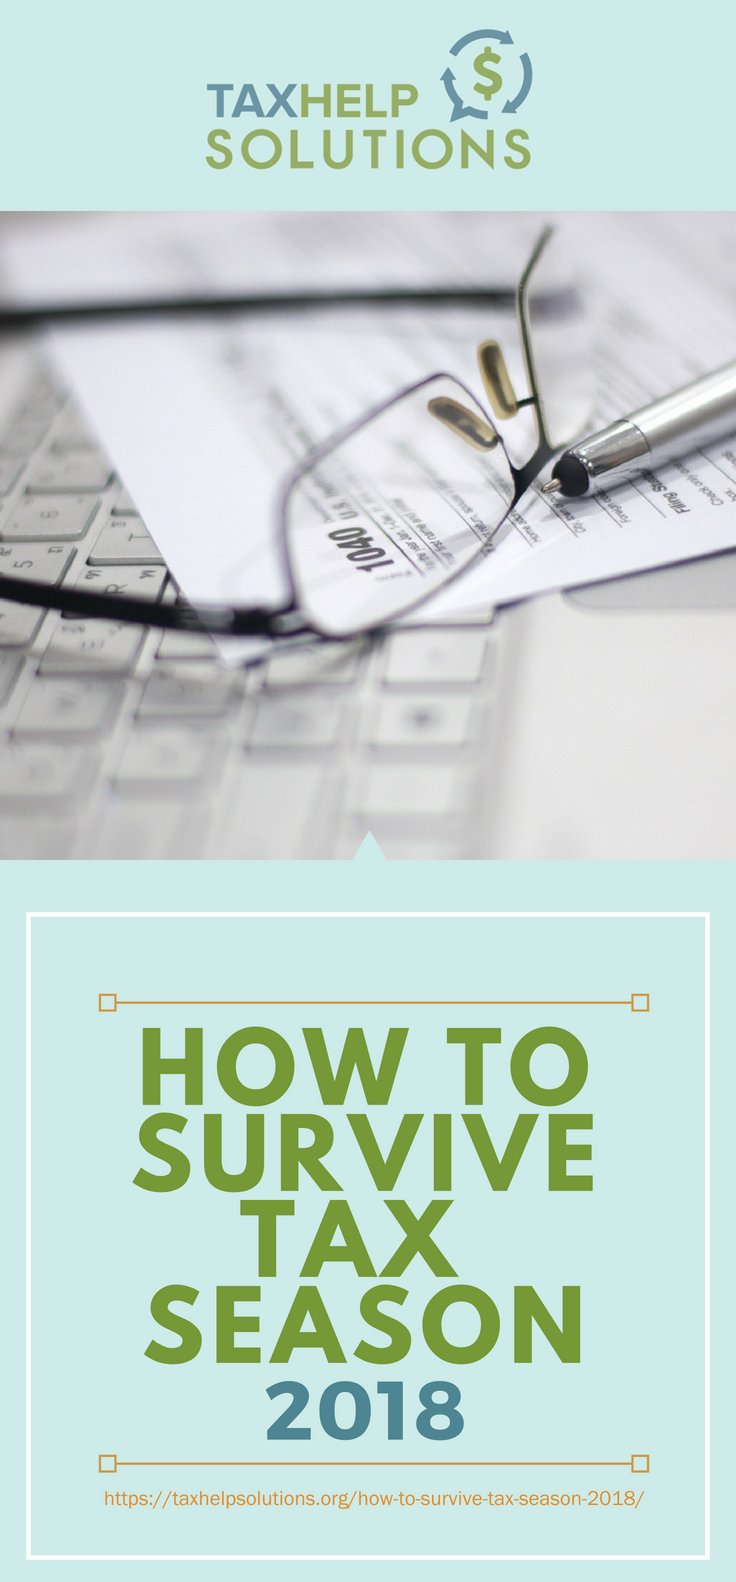 How To Survive Tax Season 2018 Tax Season Tax Help Tax